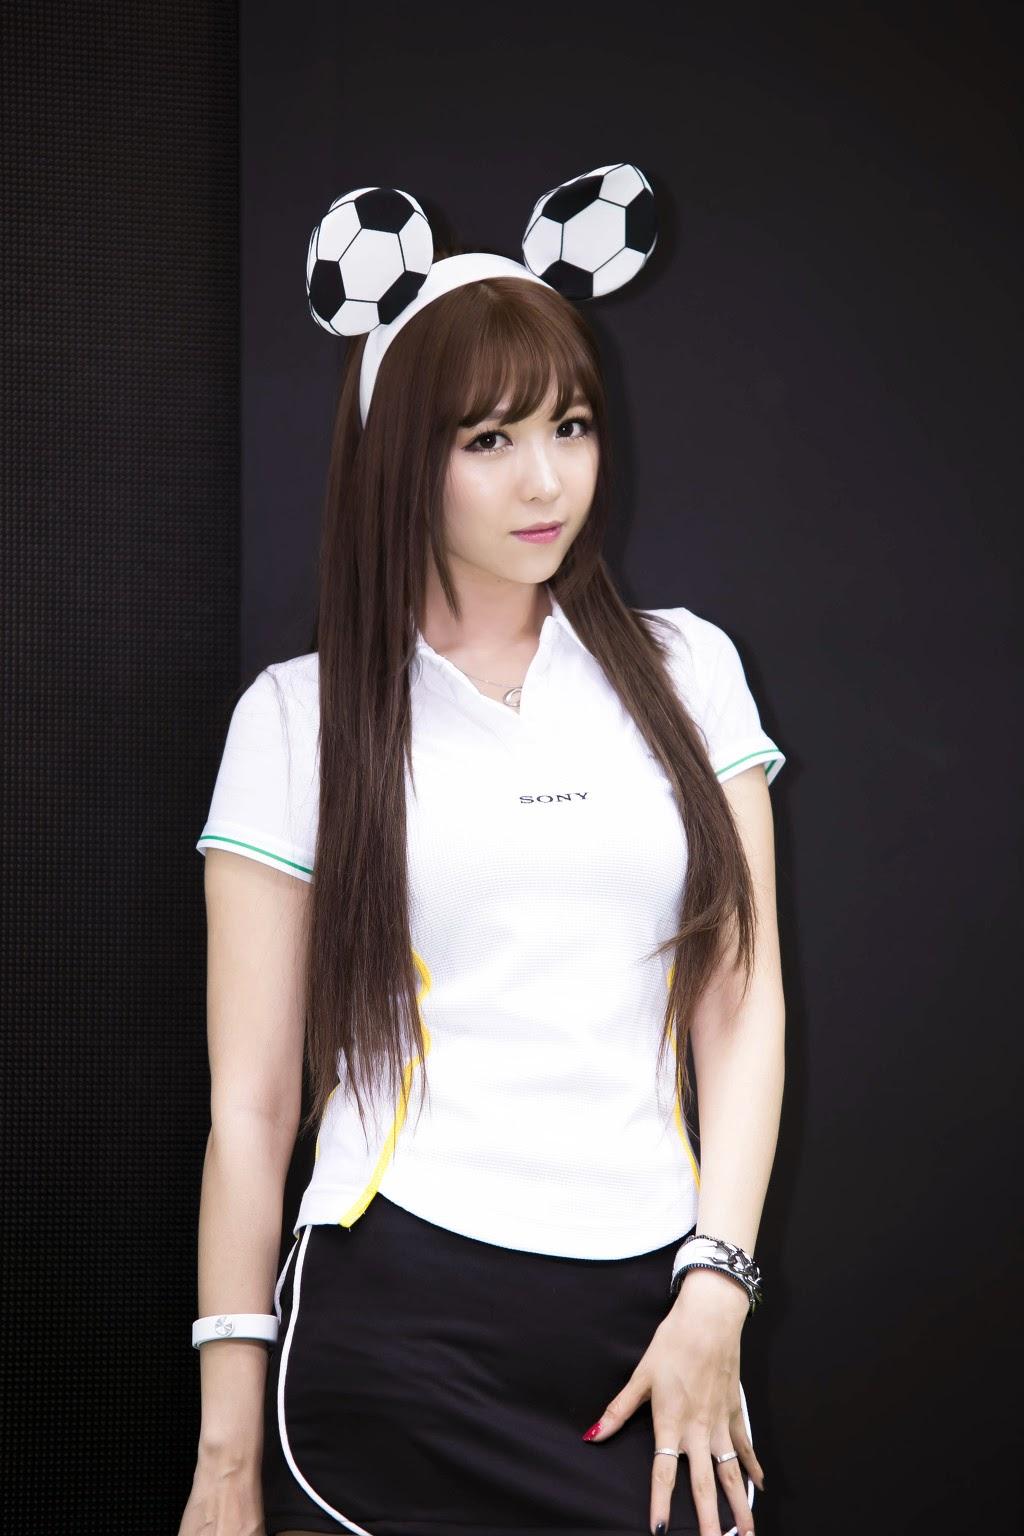 Korean Race Queens: Lee Eun Hye At Photo & Imaging Korea 2014